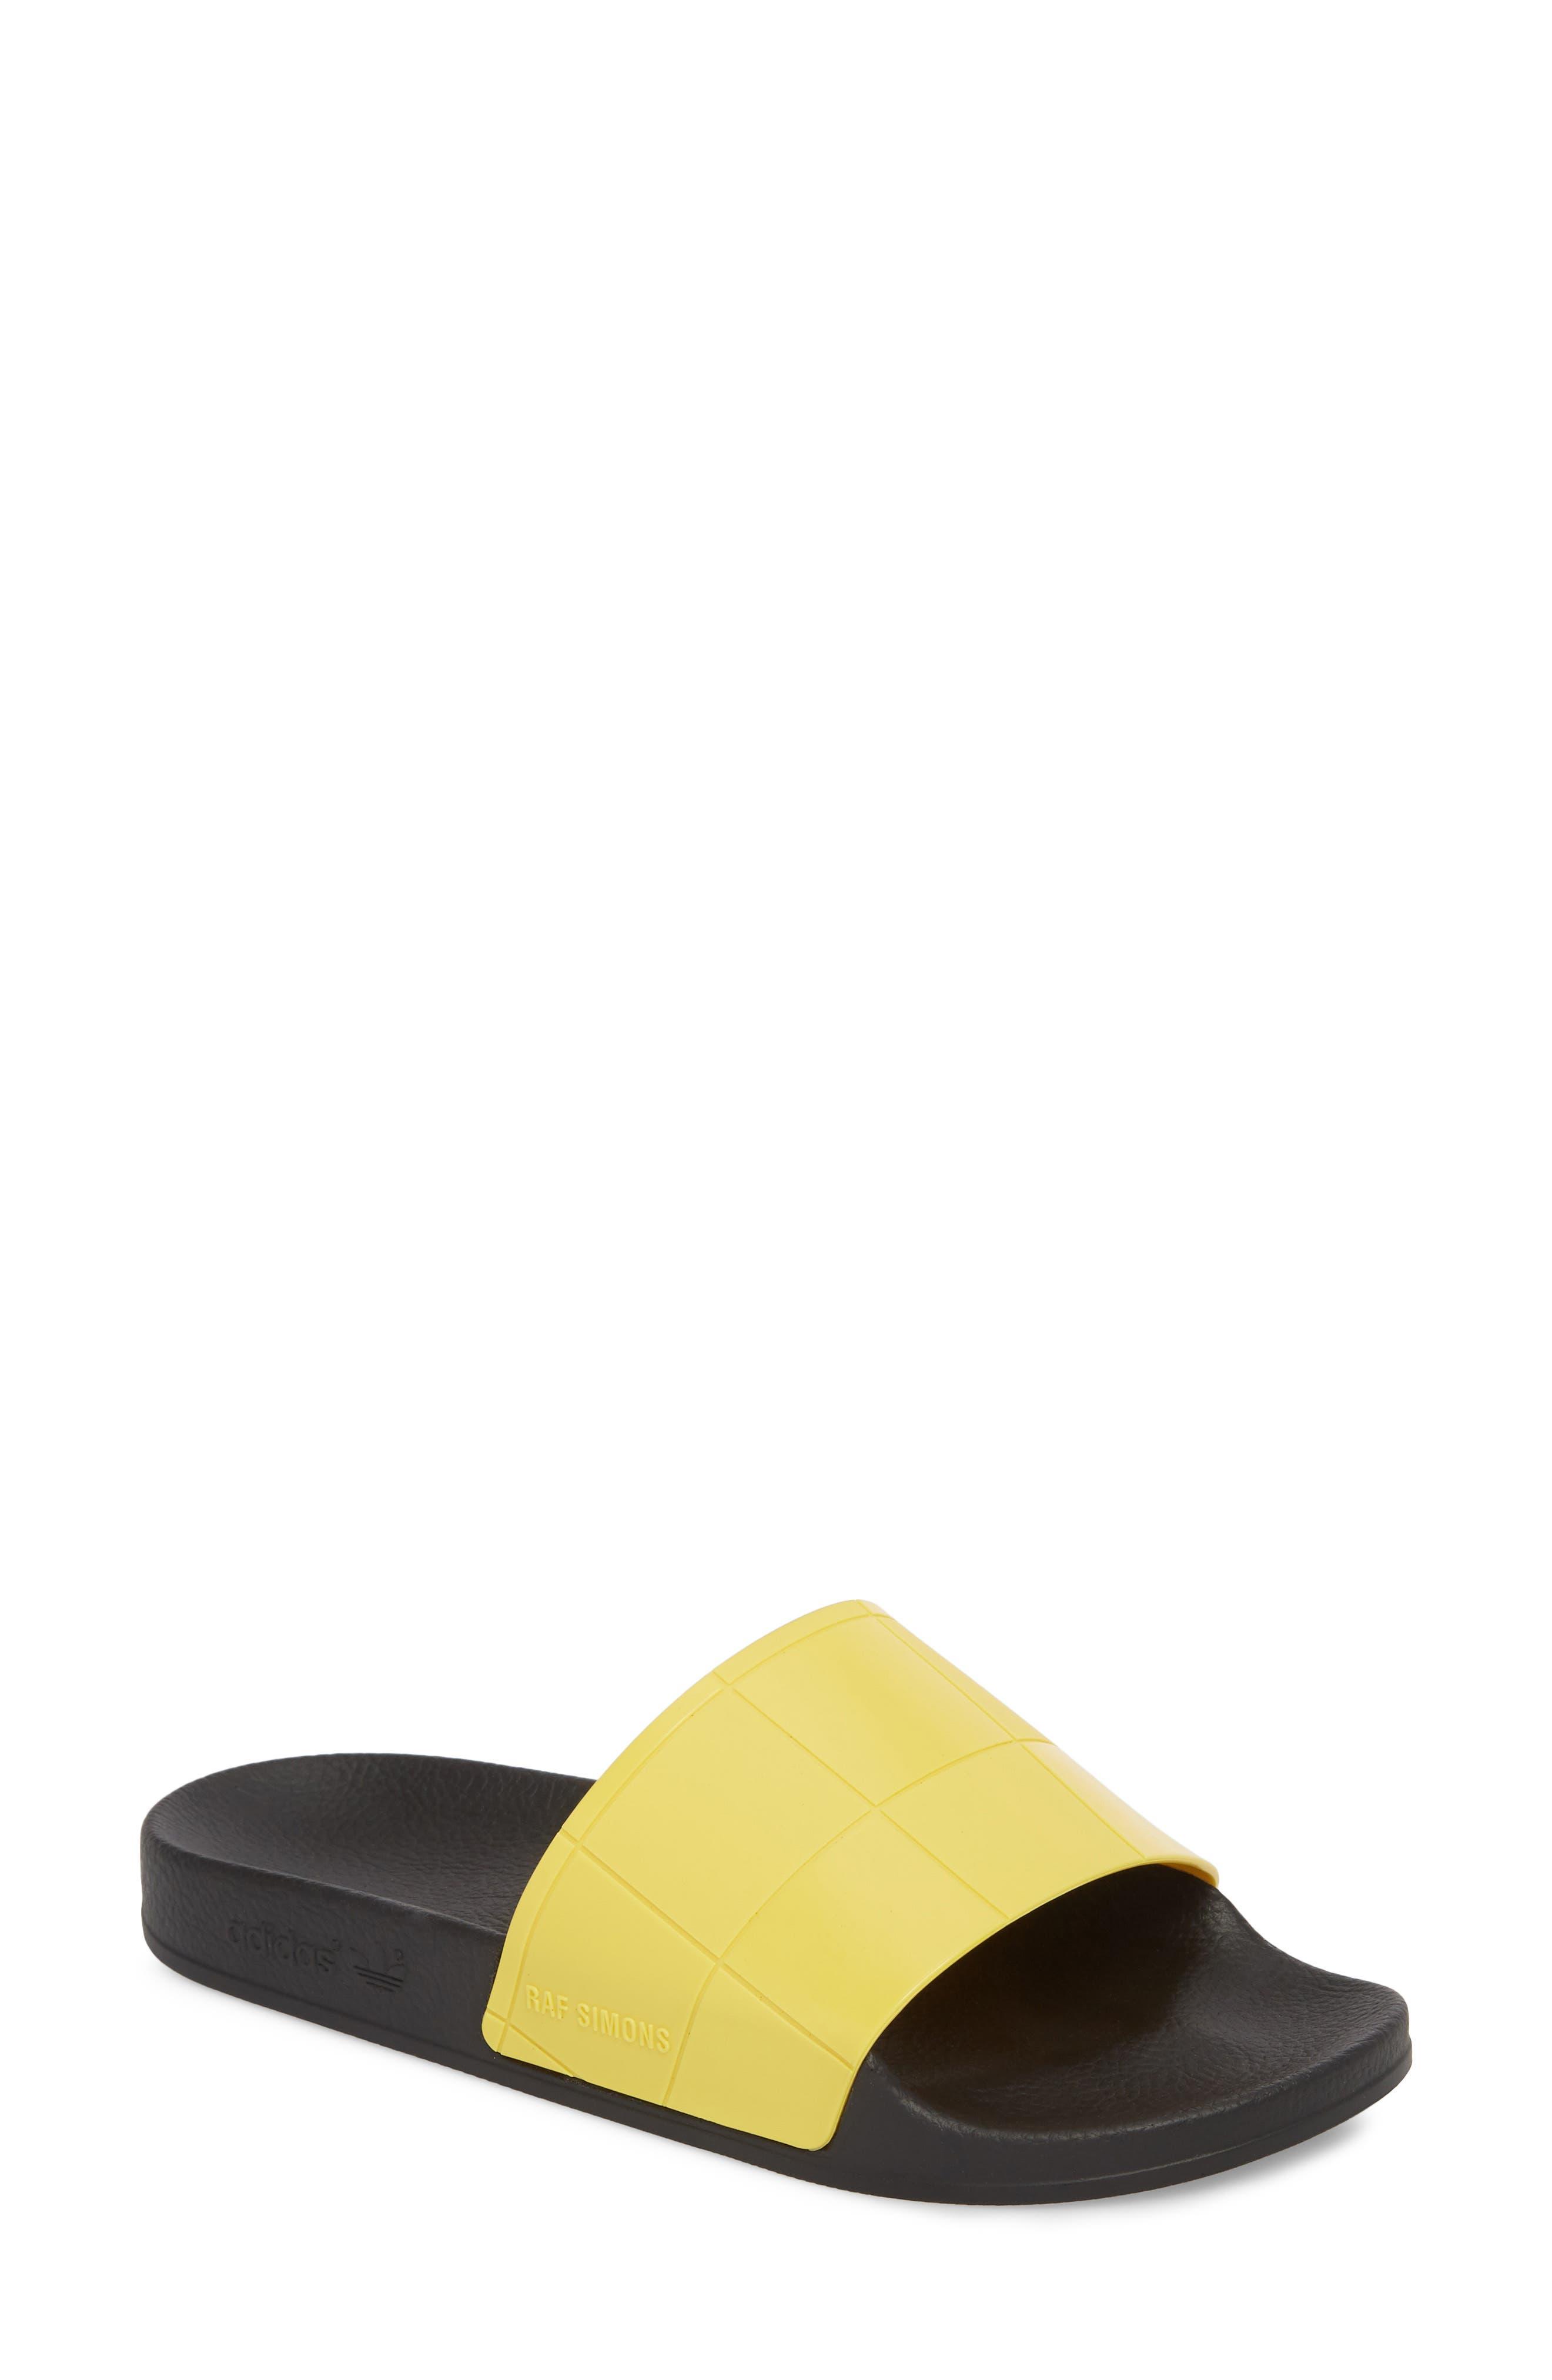 adidas by Raf Simons Adilette Slide Sandal,                             Main thumbnail 2, color,